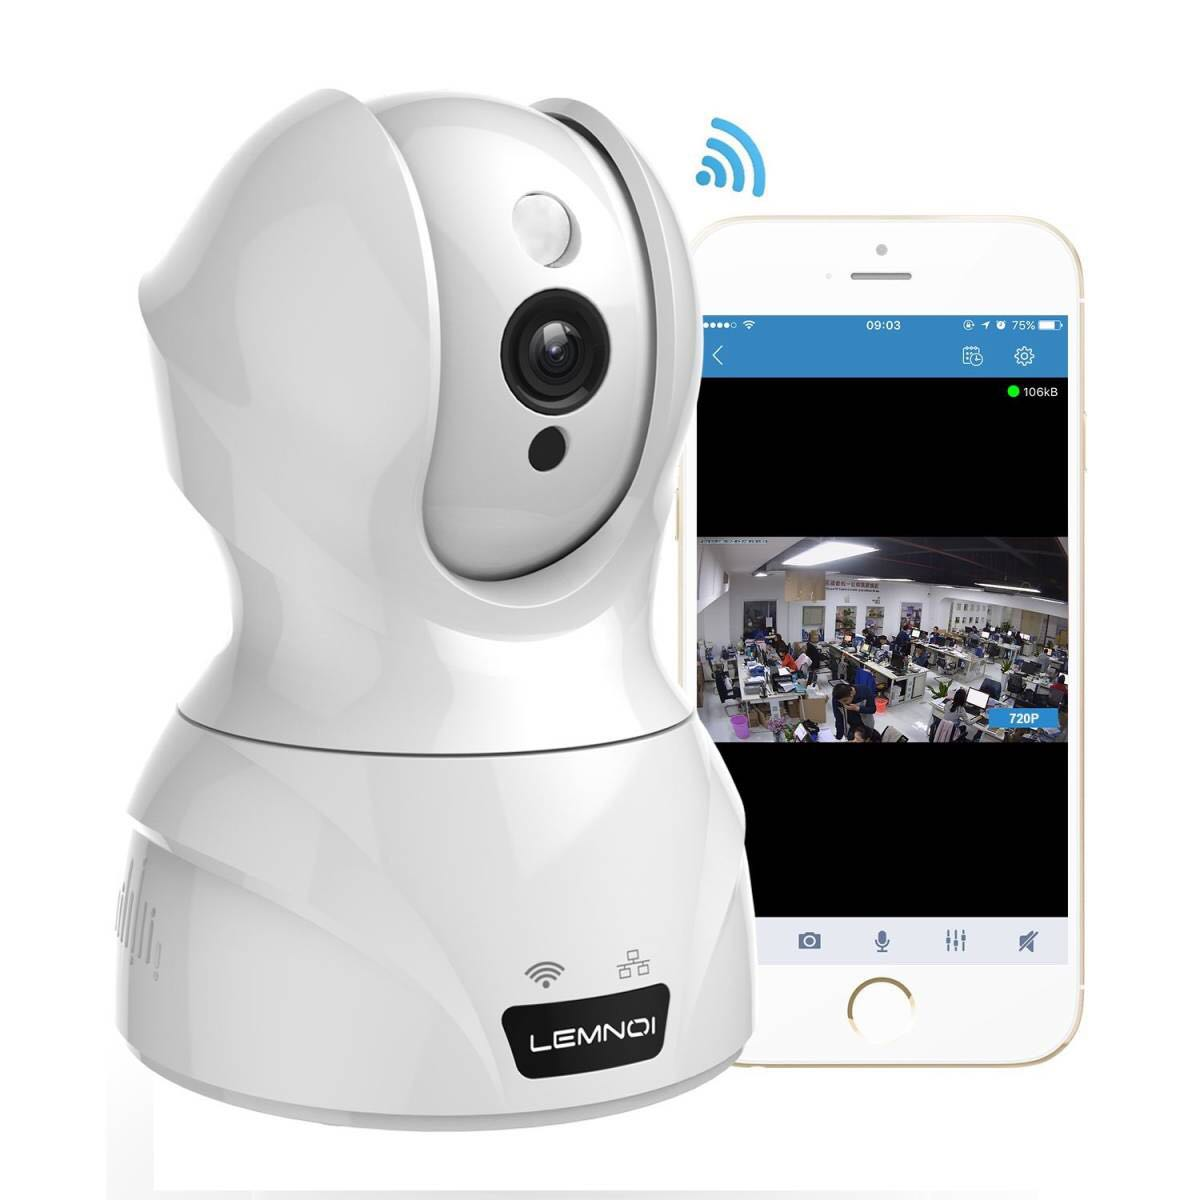 720P ネットワークカメラ スマホ対応 WIFI 防犯 監視 介護 ペット留守番 暗視撮影 動体検知 日本語アプリ